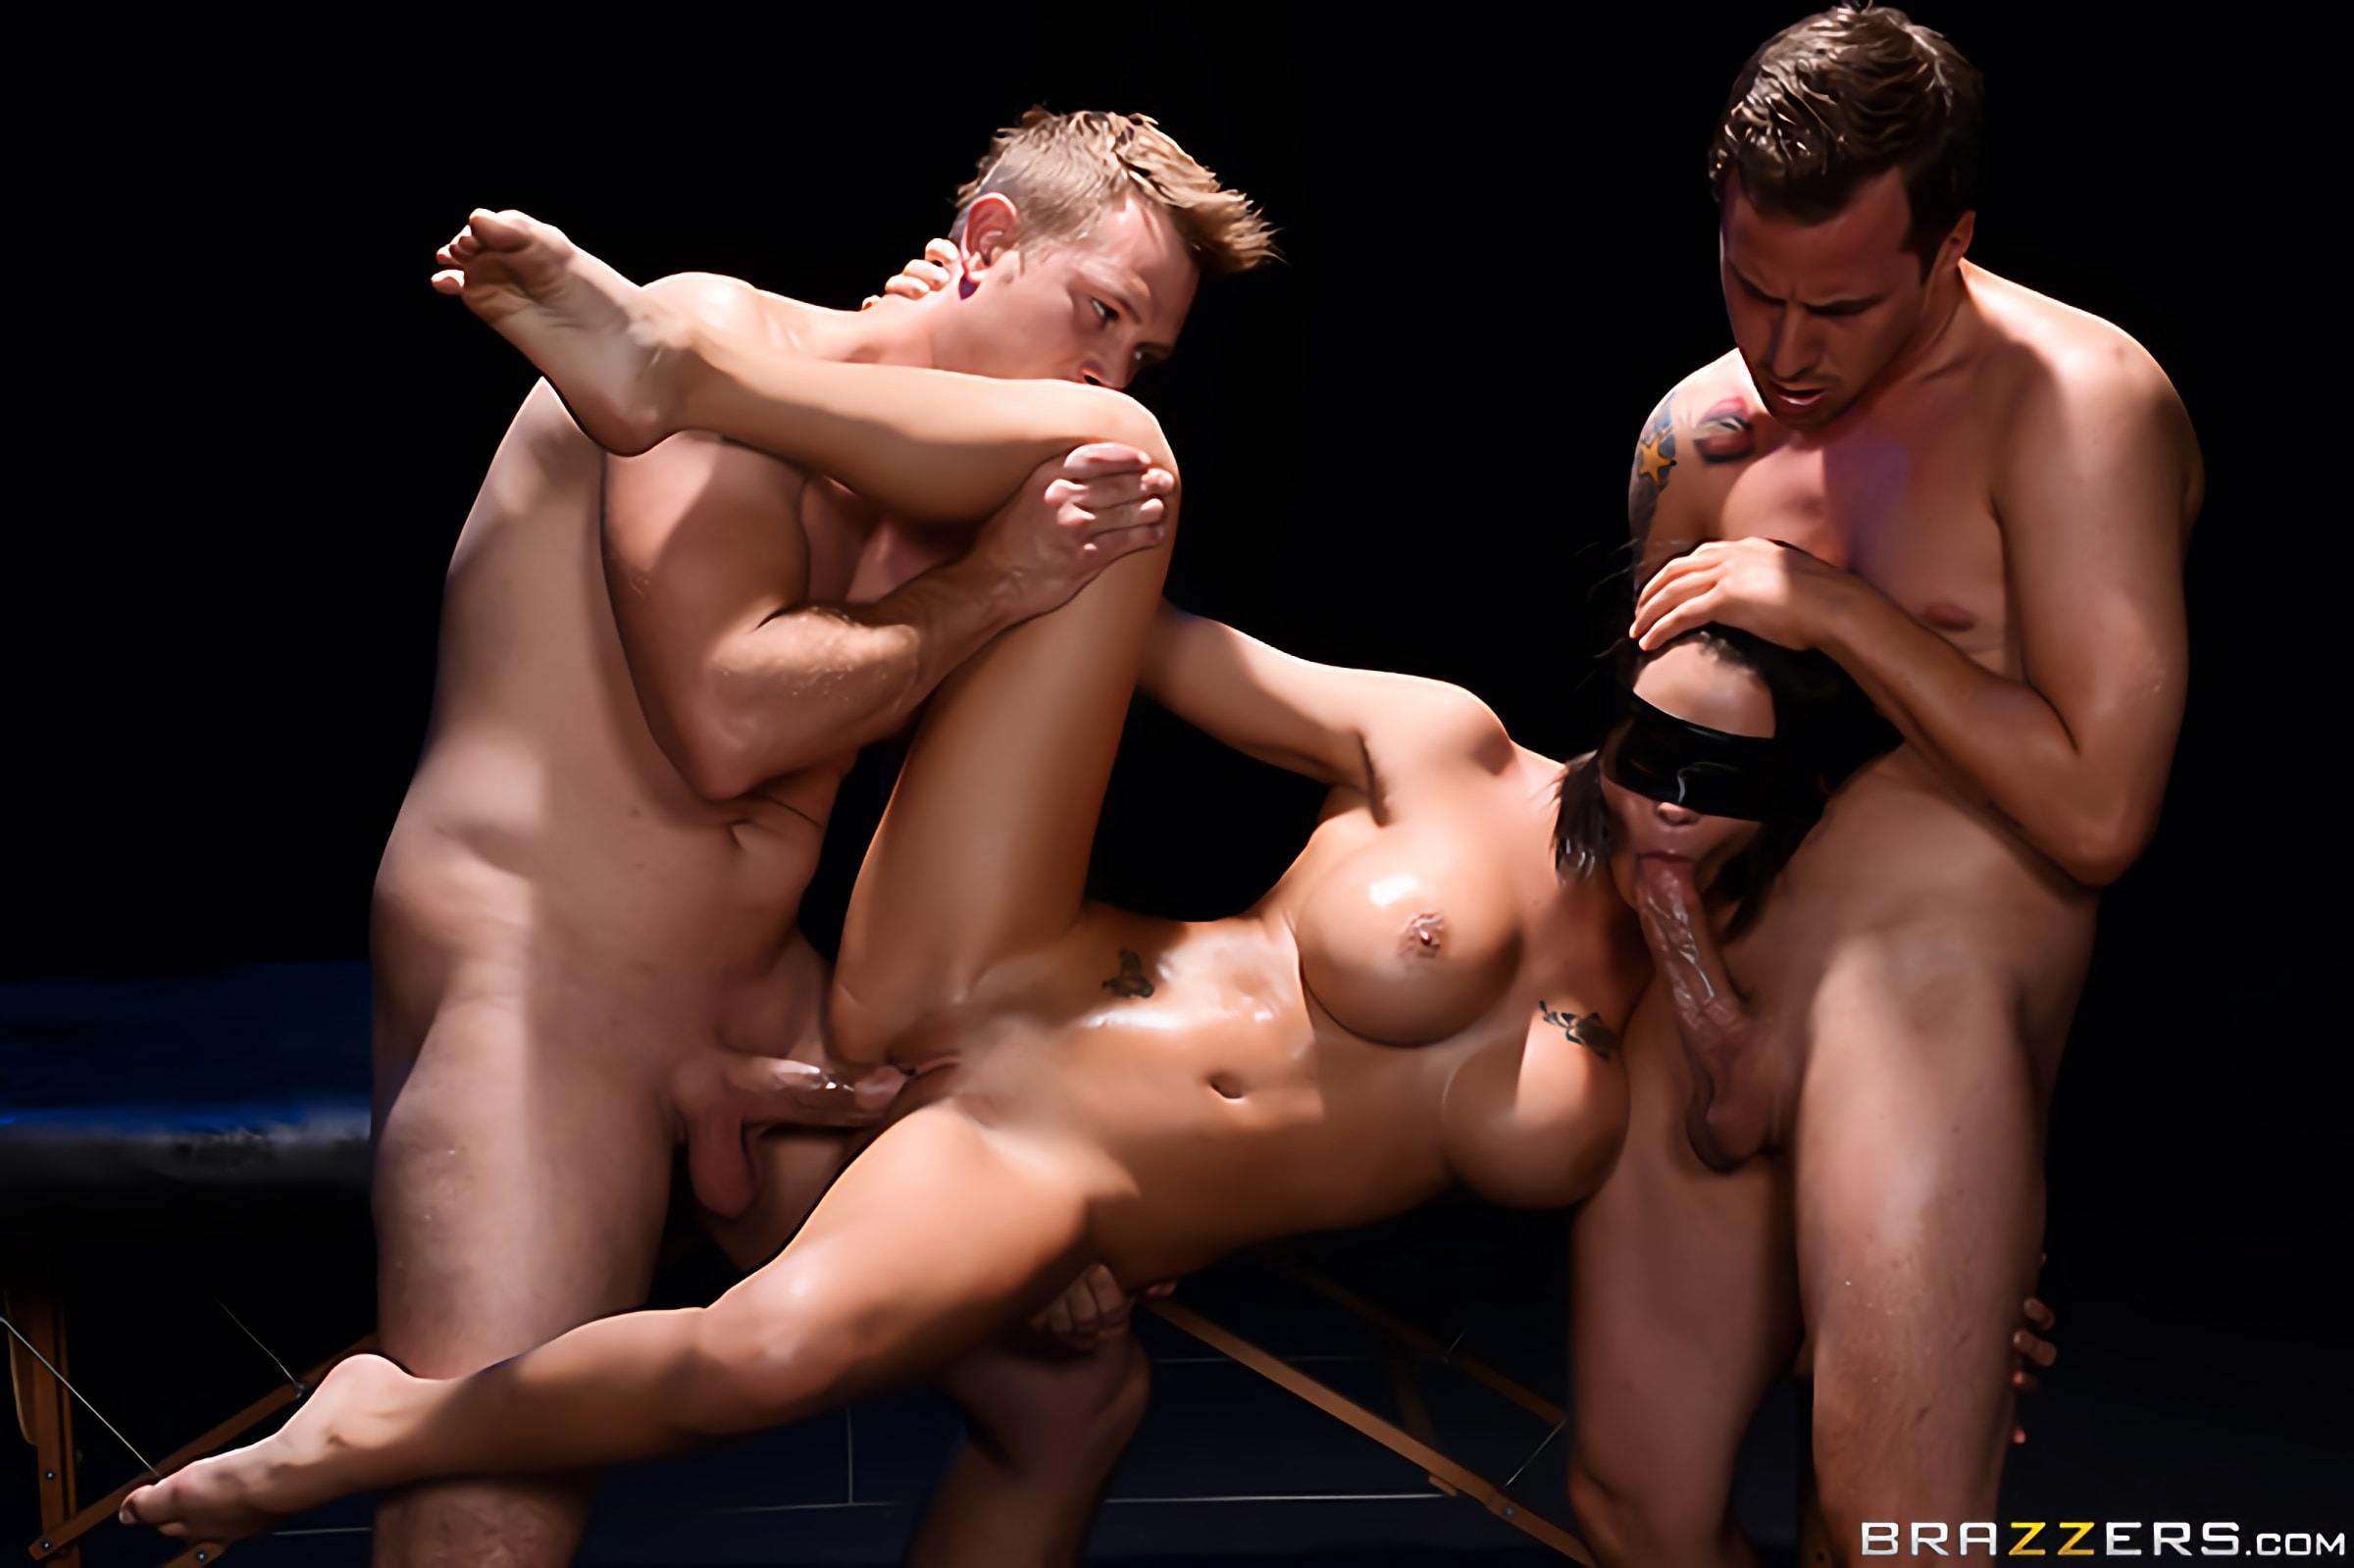 Peta Jensen Blindfold Massage